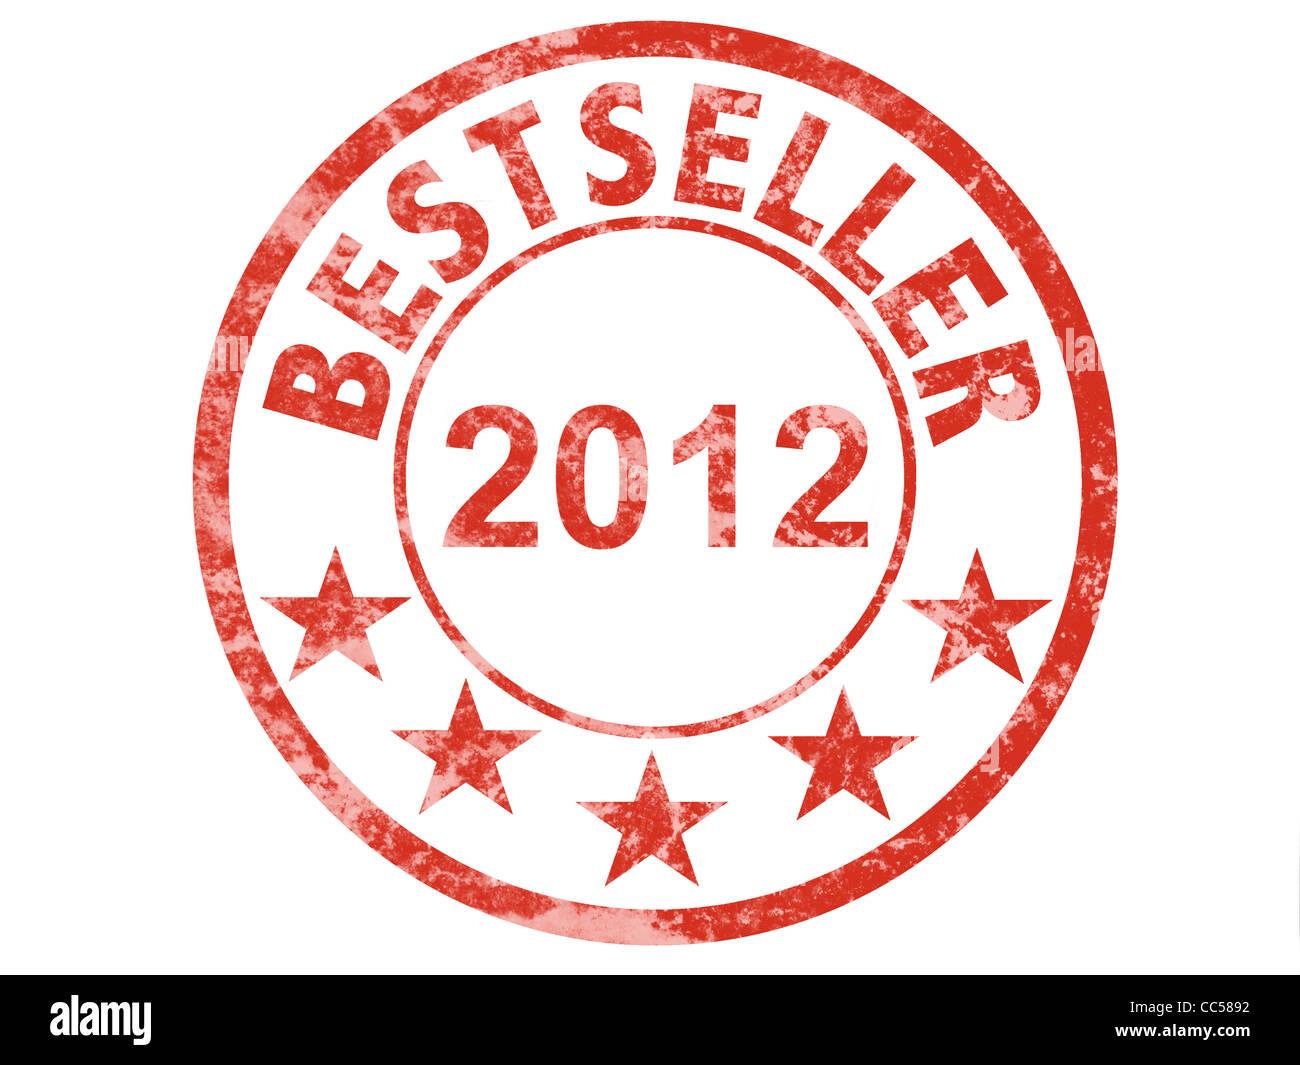 grunge rubber stamp bestseller 2012 - Stock Image